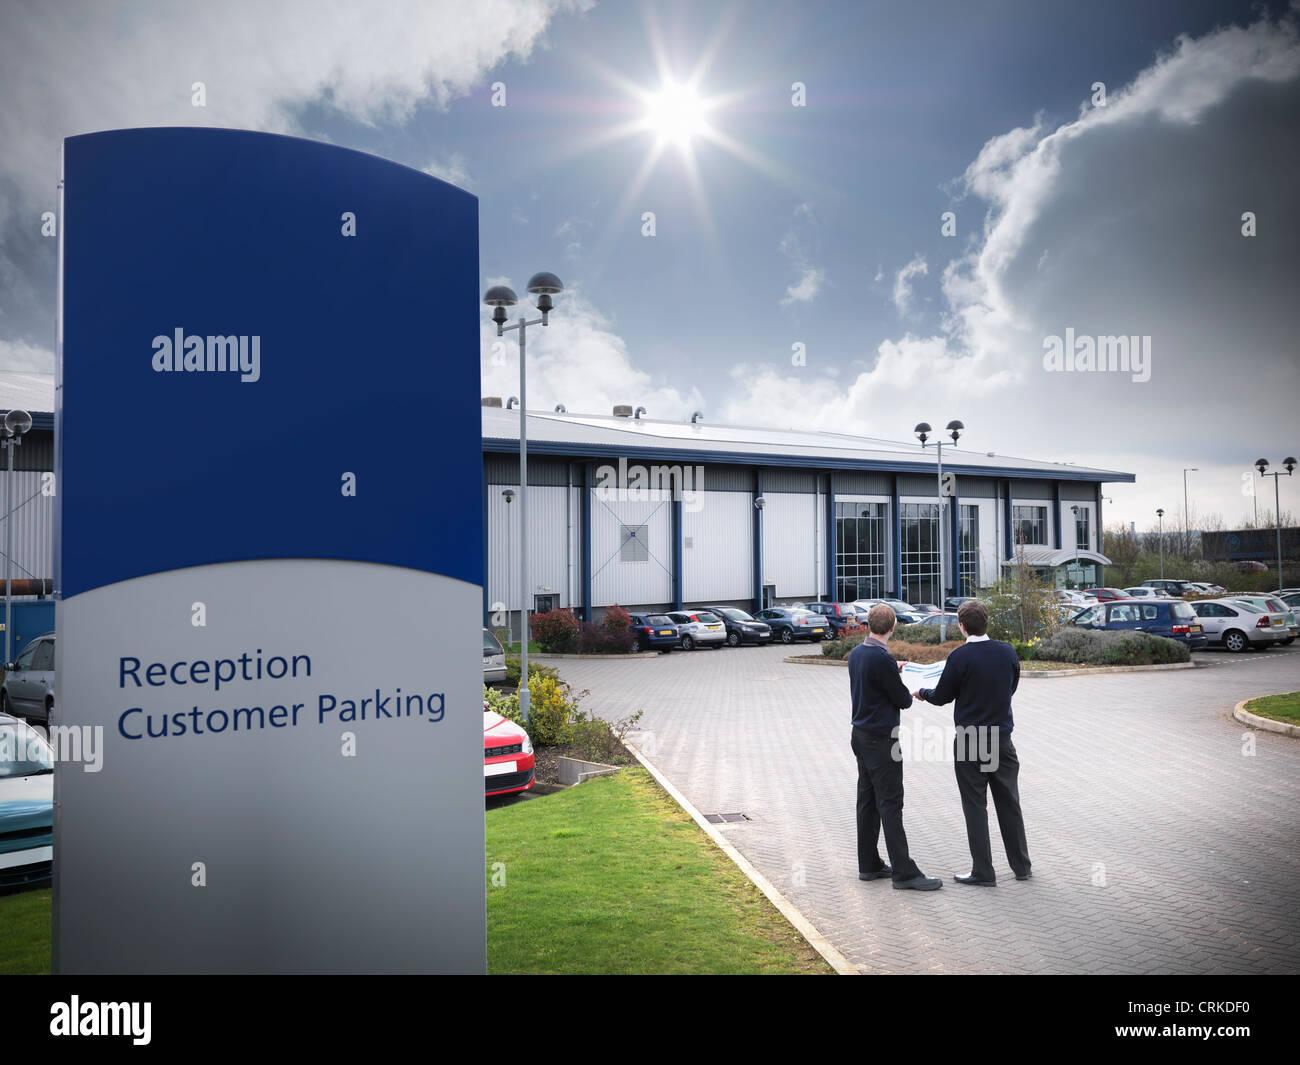 Businessmen standing in parking lot - Stock Image